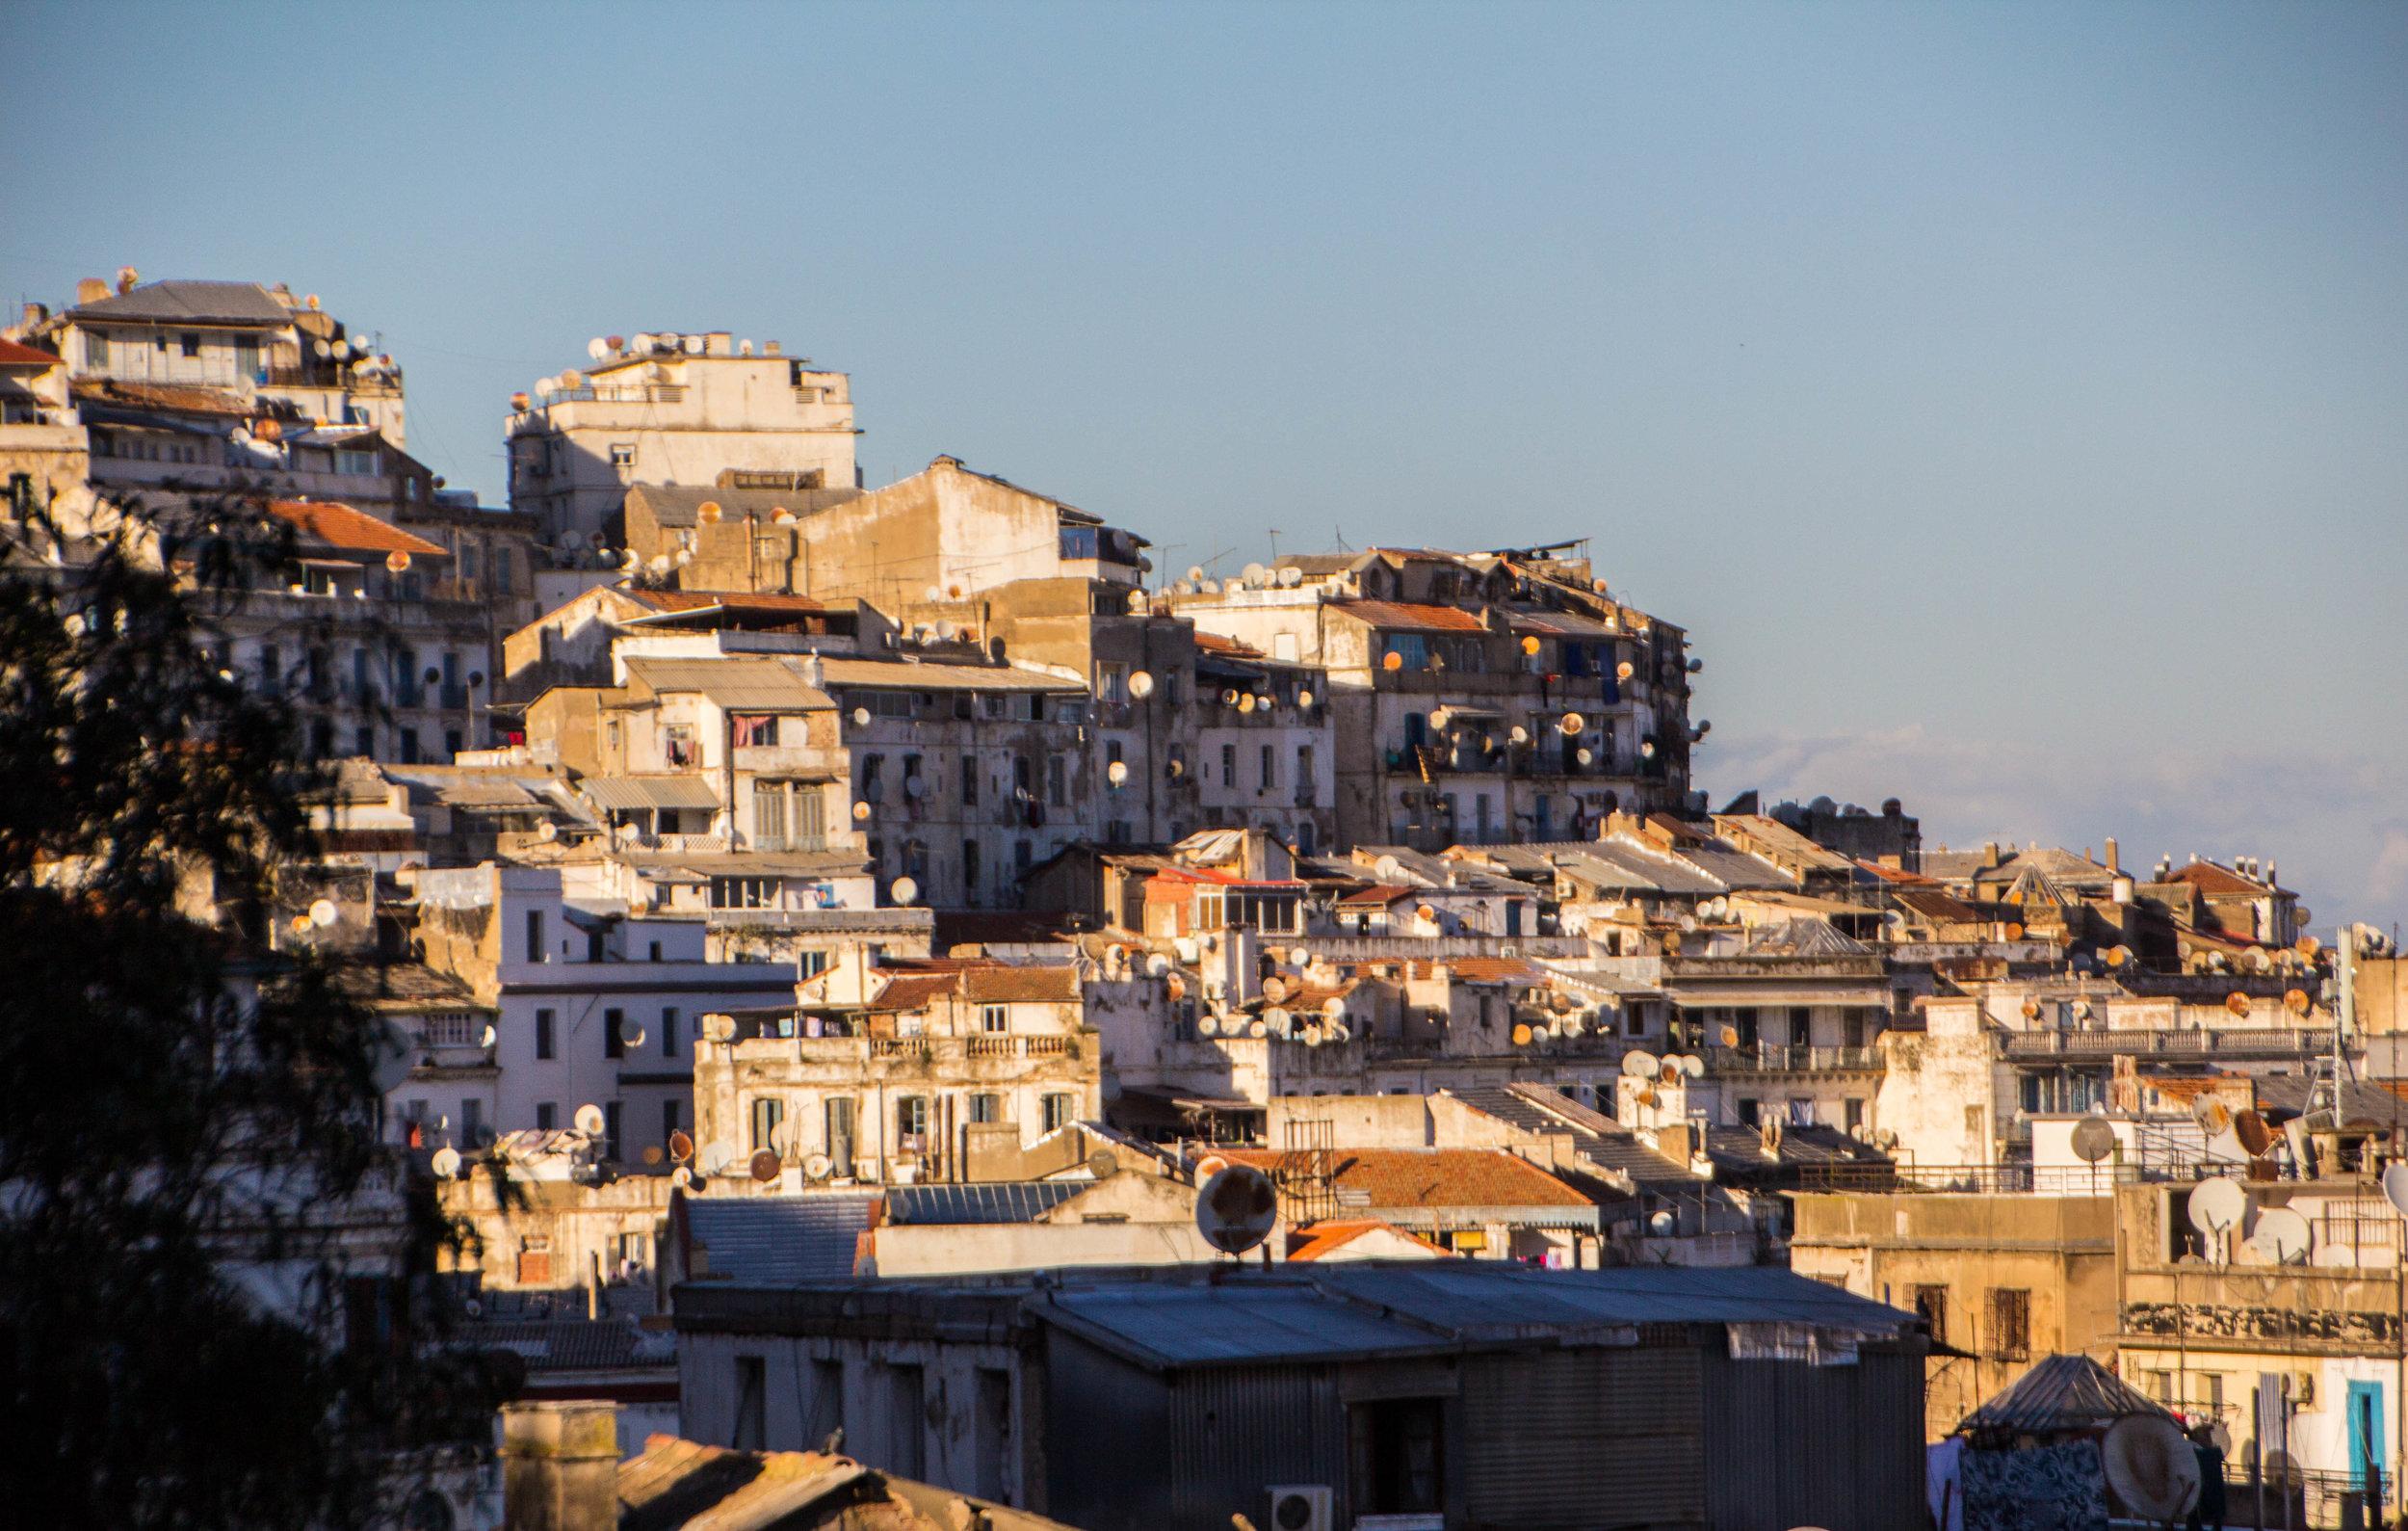 streets-algiers-algeria-17-2.jpg